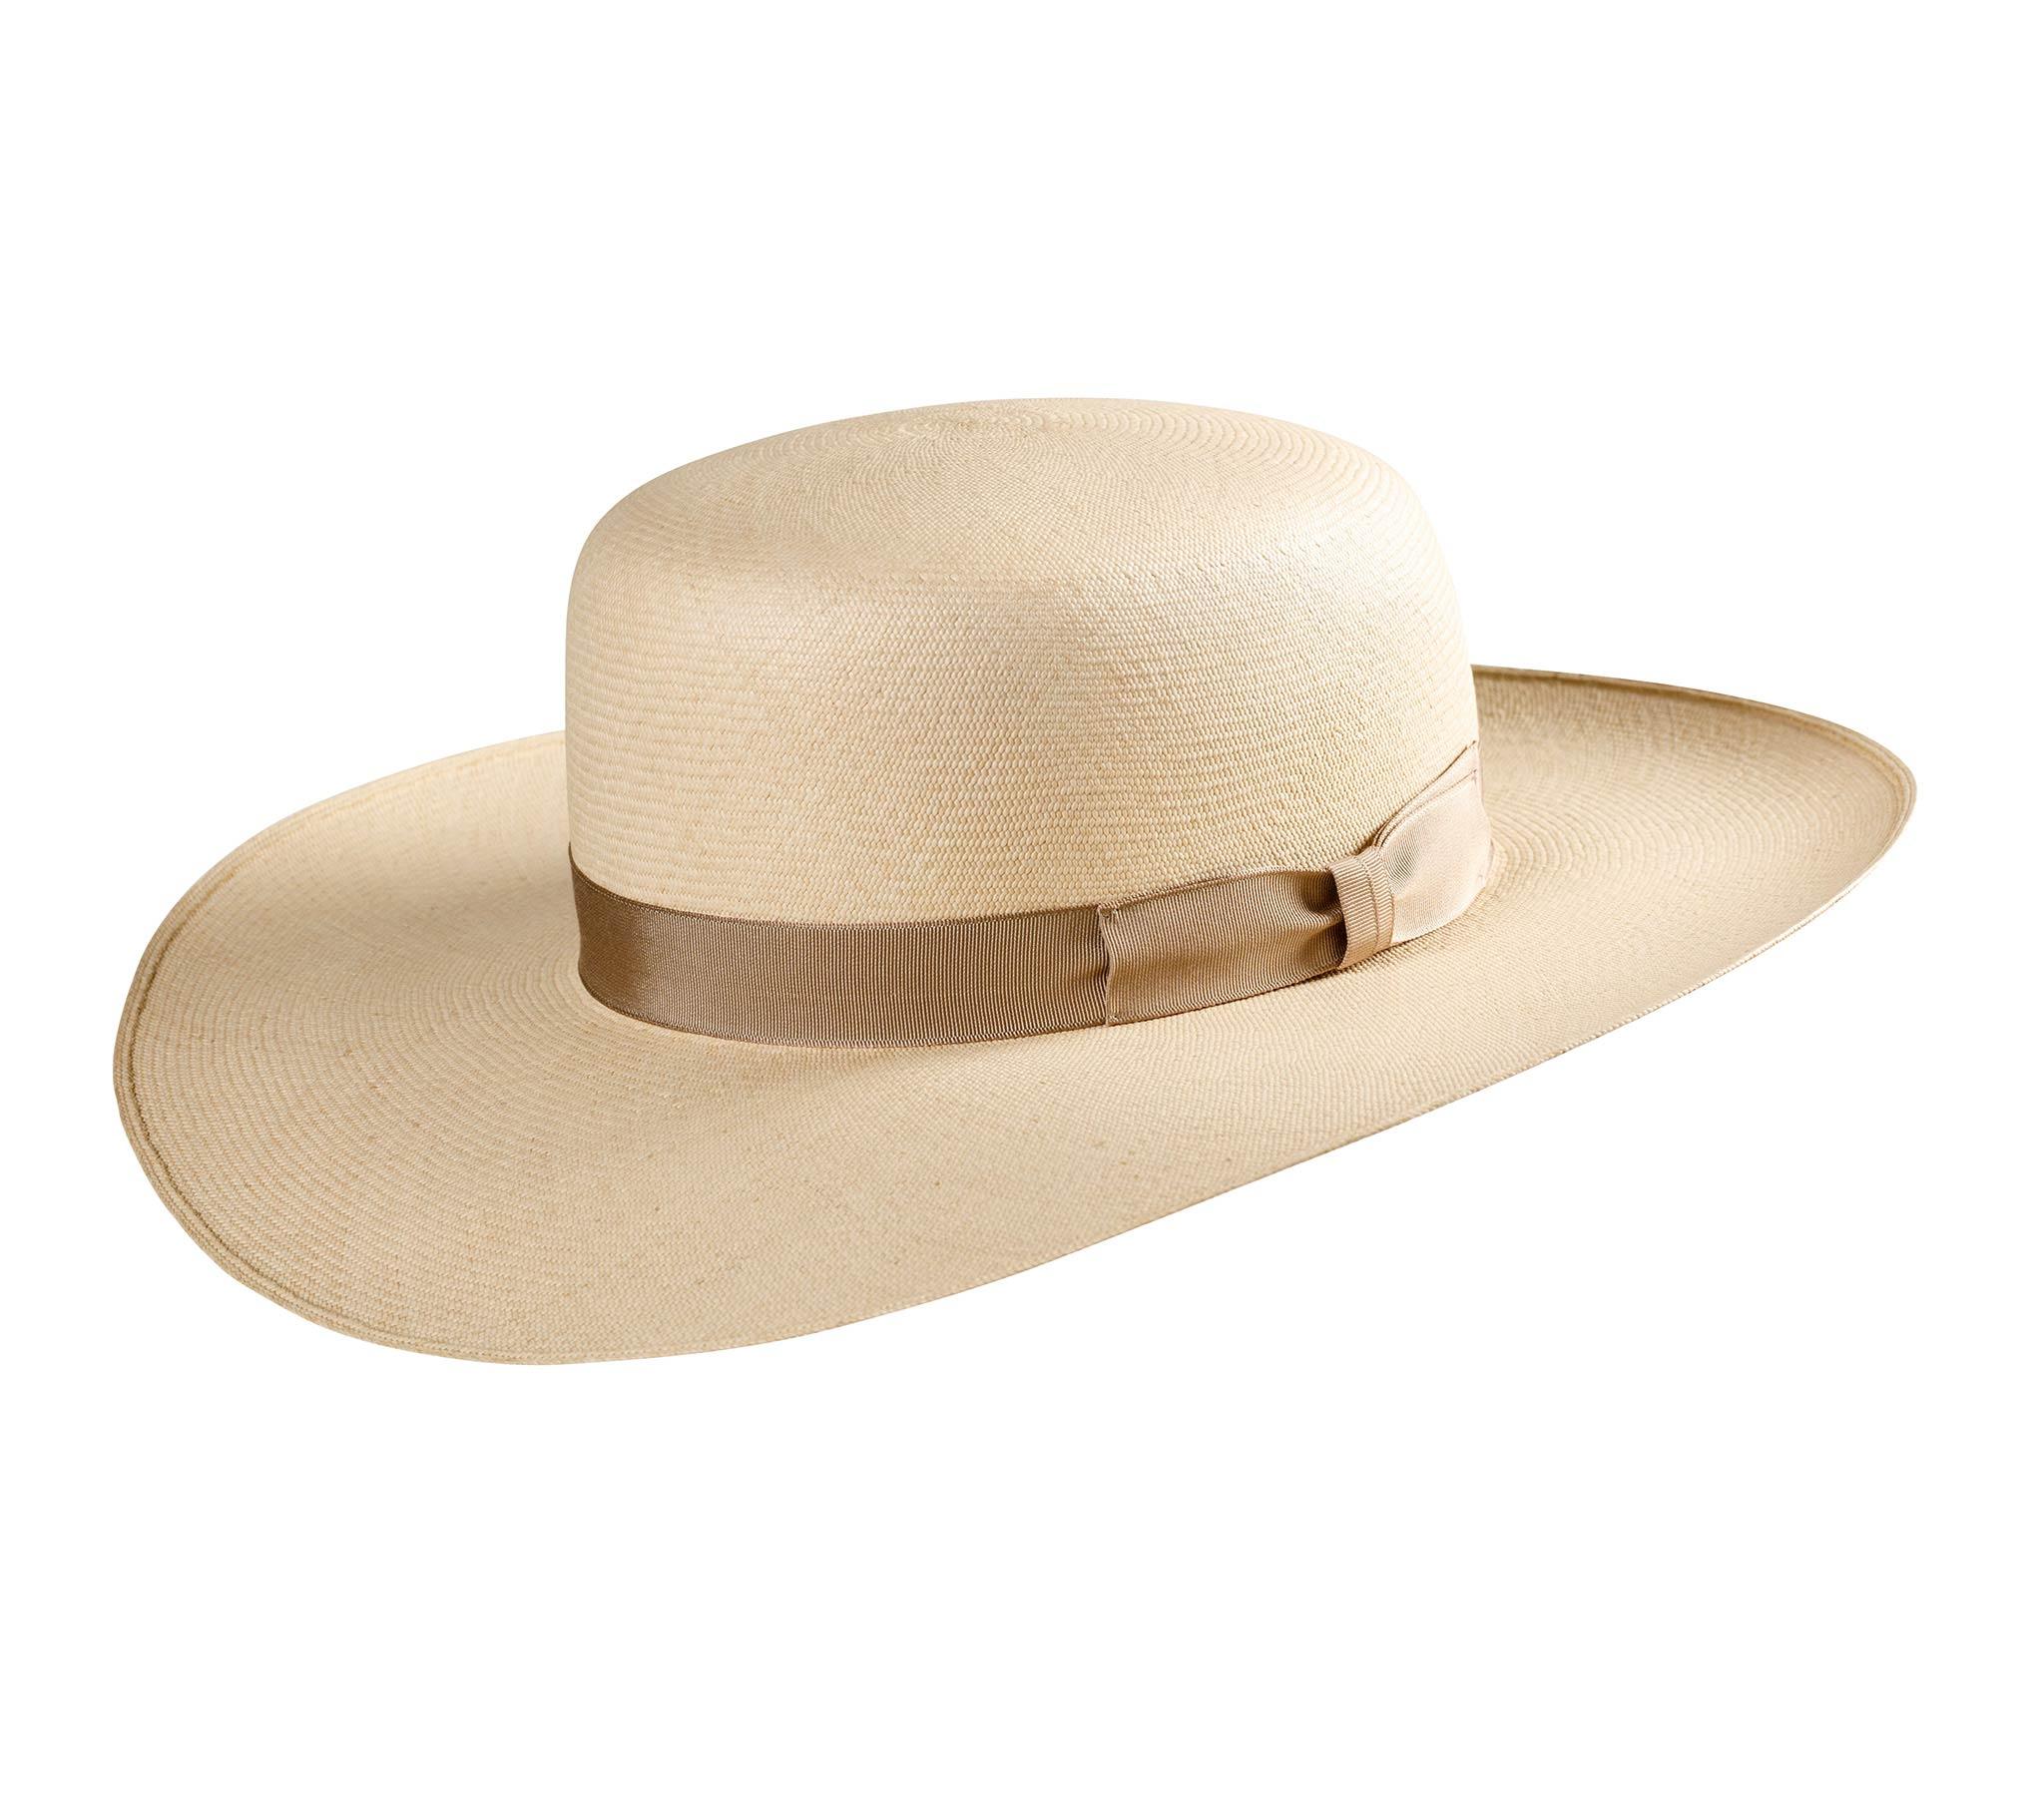 Balenciaga Panama Hat